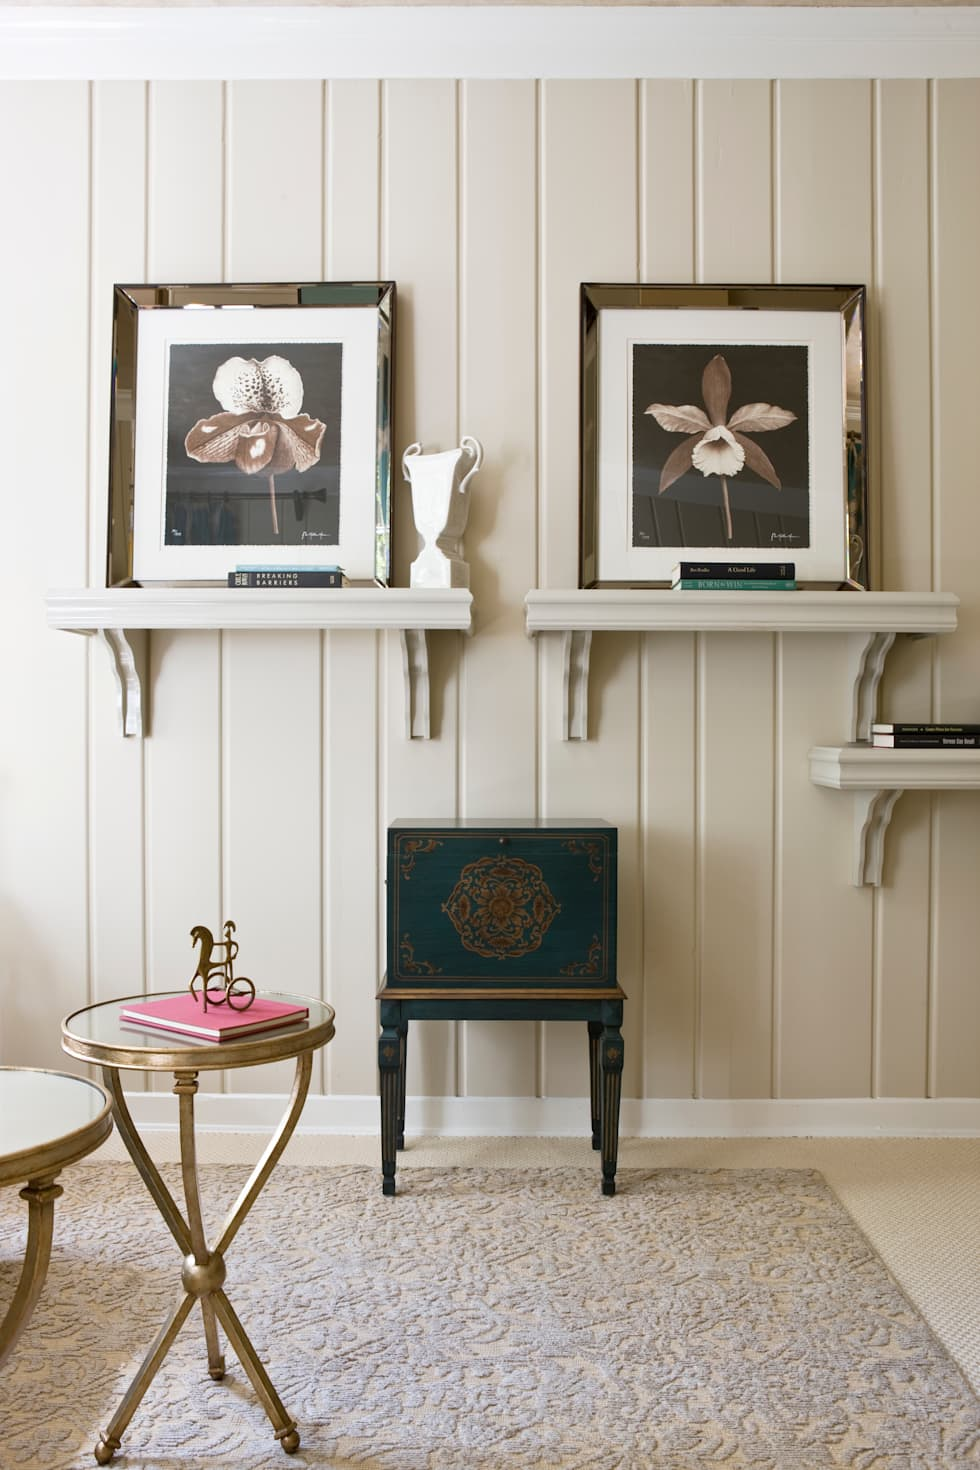 DC Design House - Wood Paneling & Shelving: modern Living room by Lorna Gross Interior Design